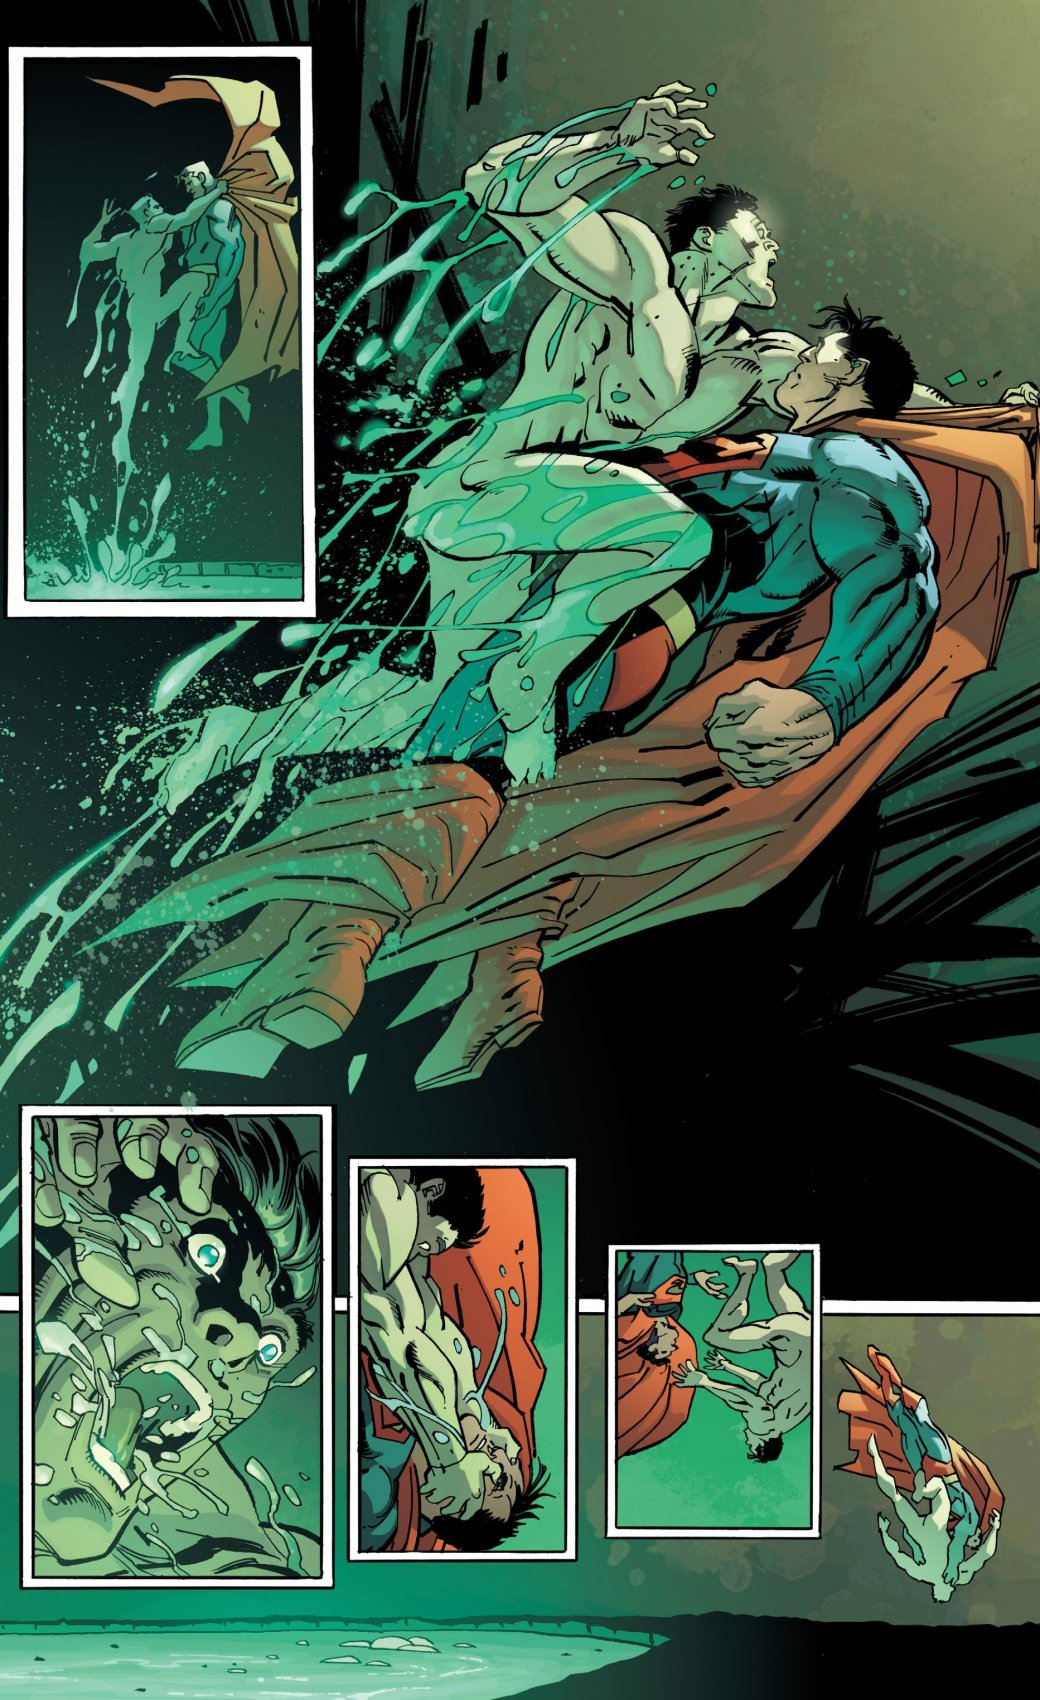 The Dark Knight: что нетак скомиксами Фрэнка Миллера про Бэтмена? | Канобу - Изображение 20